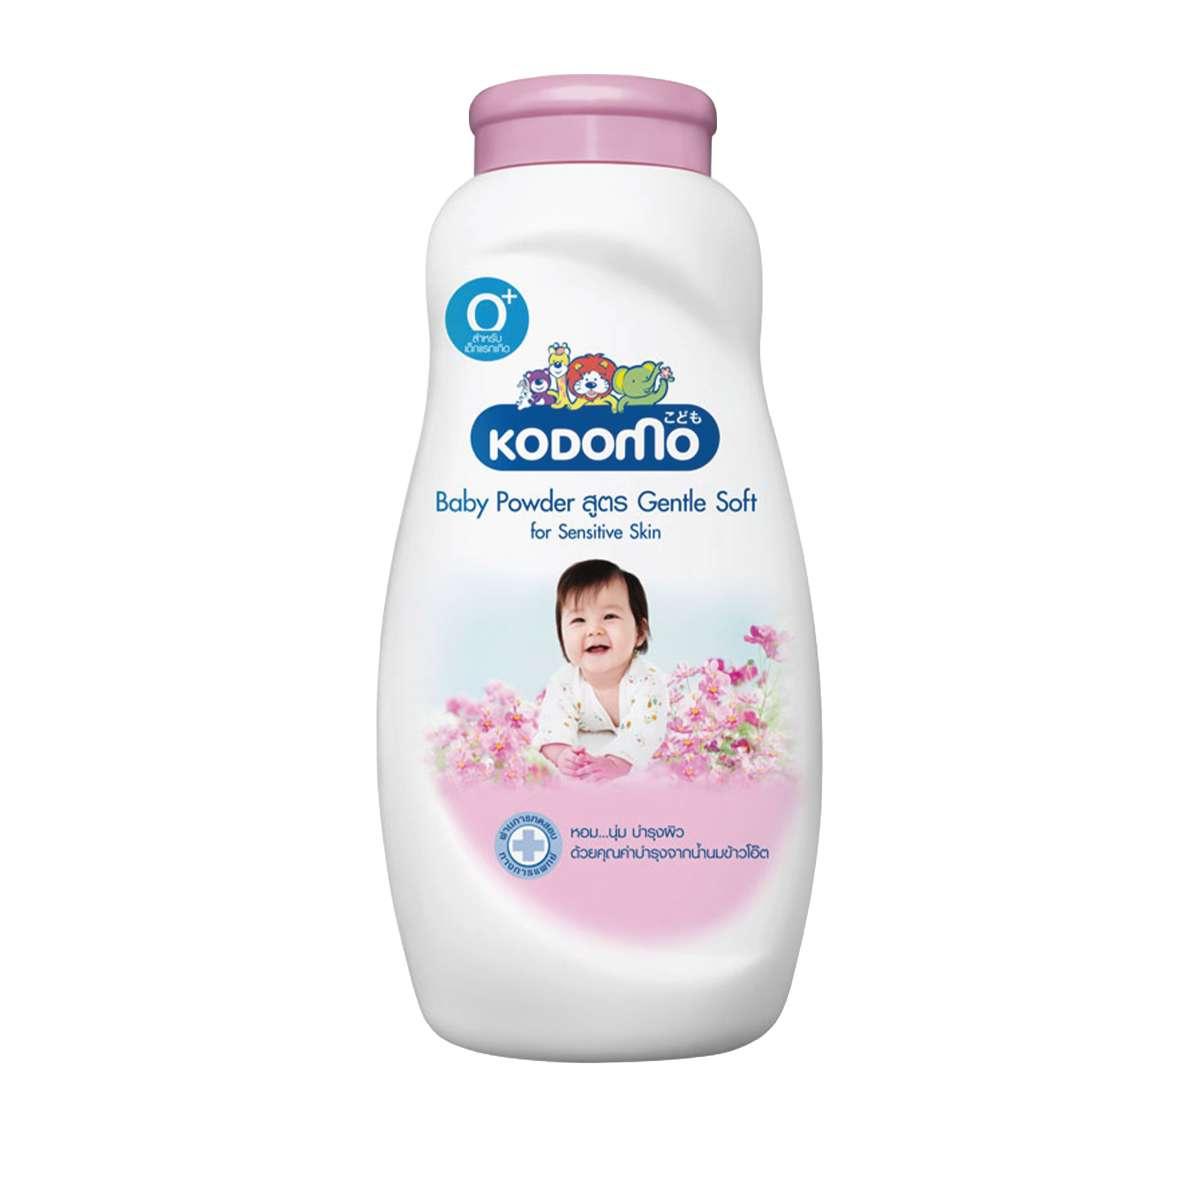 KODOMO Baby Powder Gentle Soft 200 gm